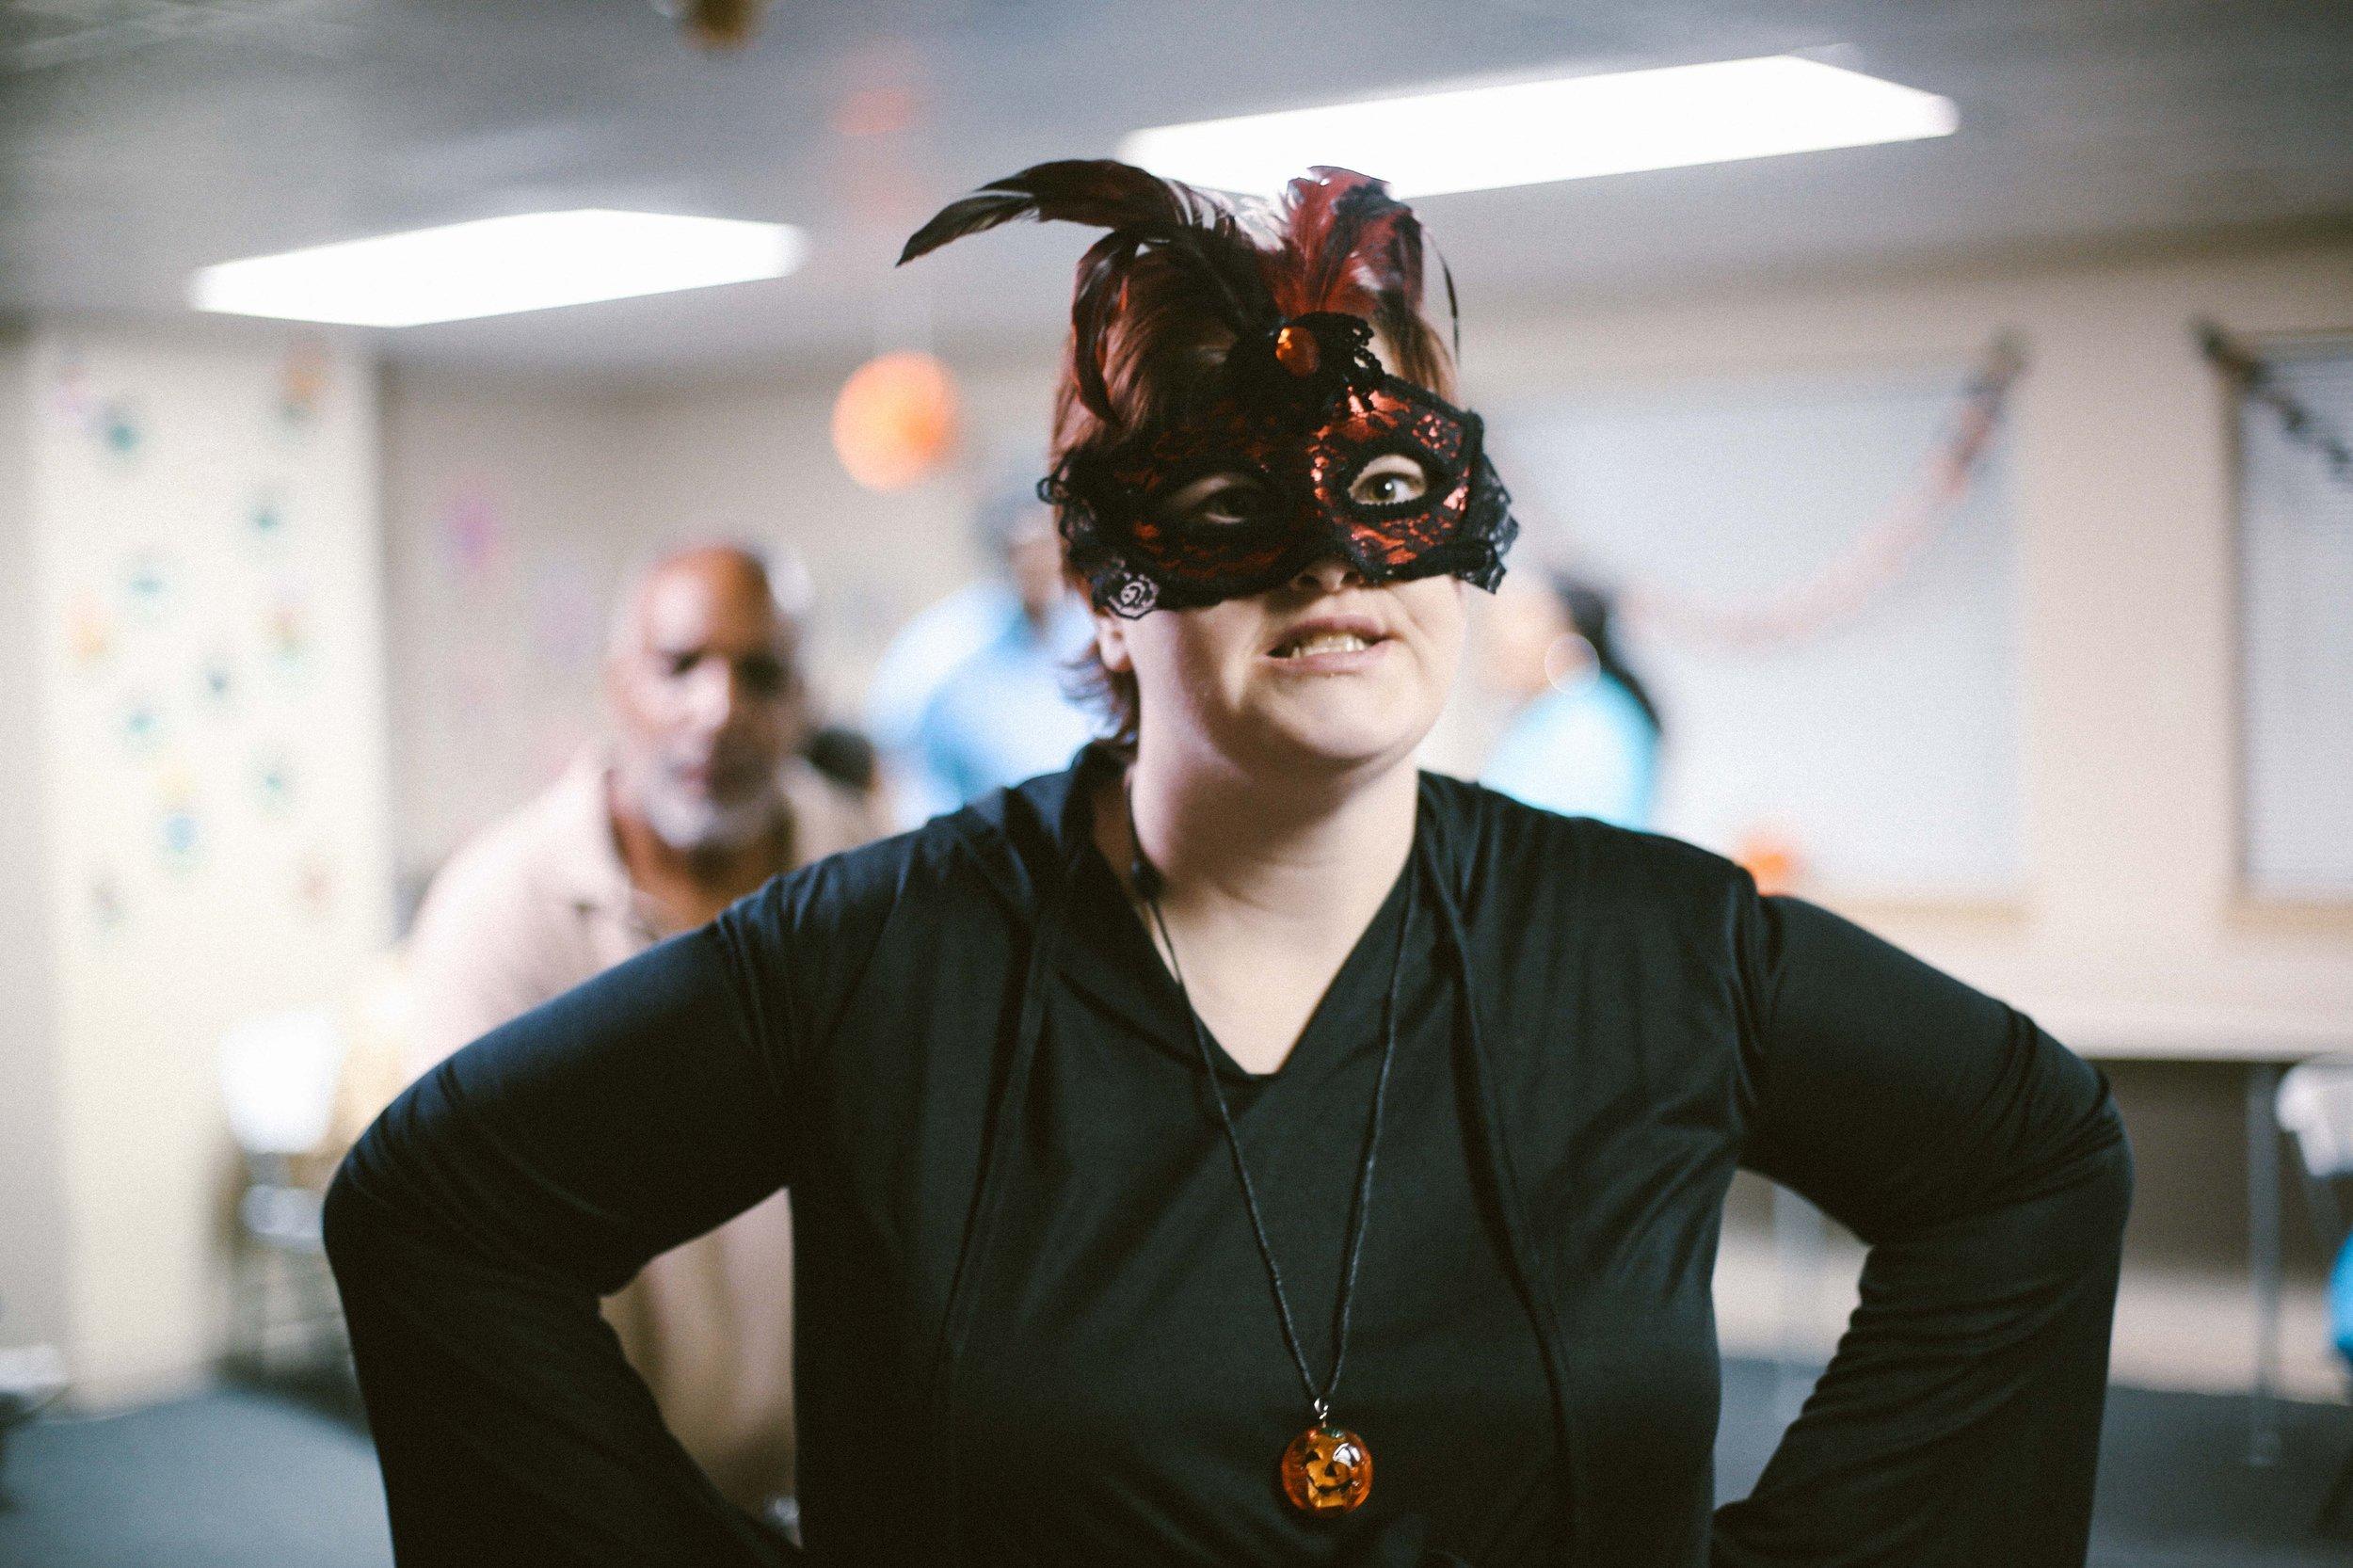 Masquerade mask!